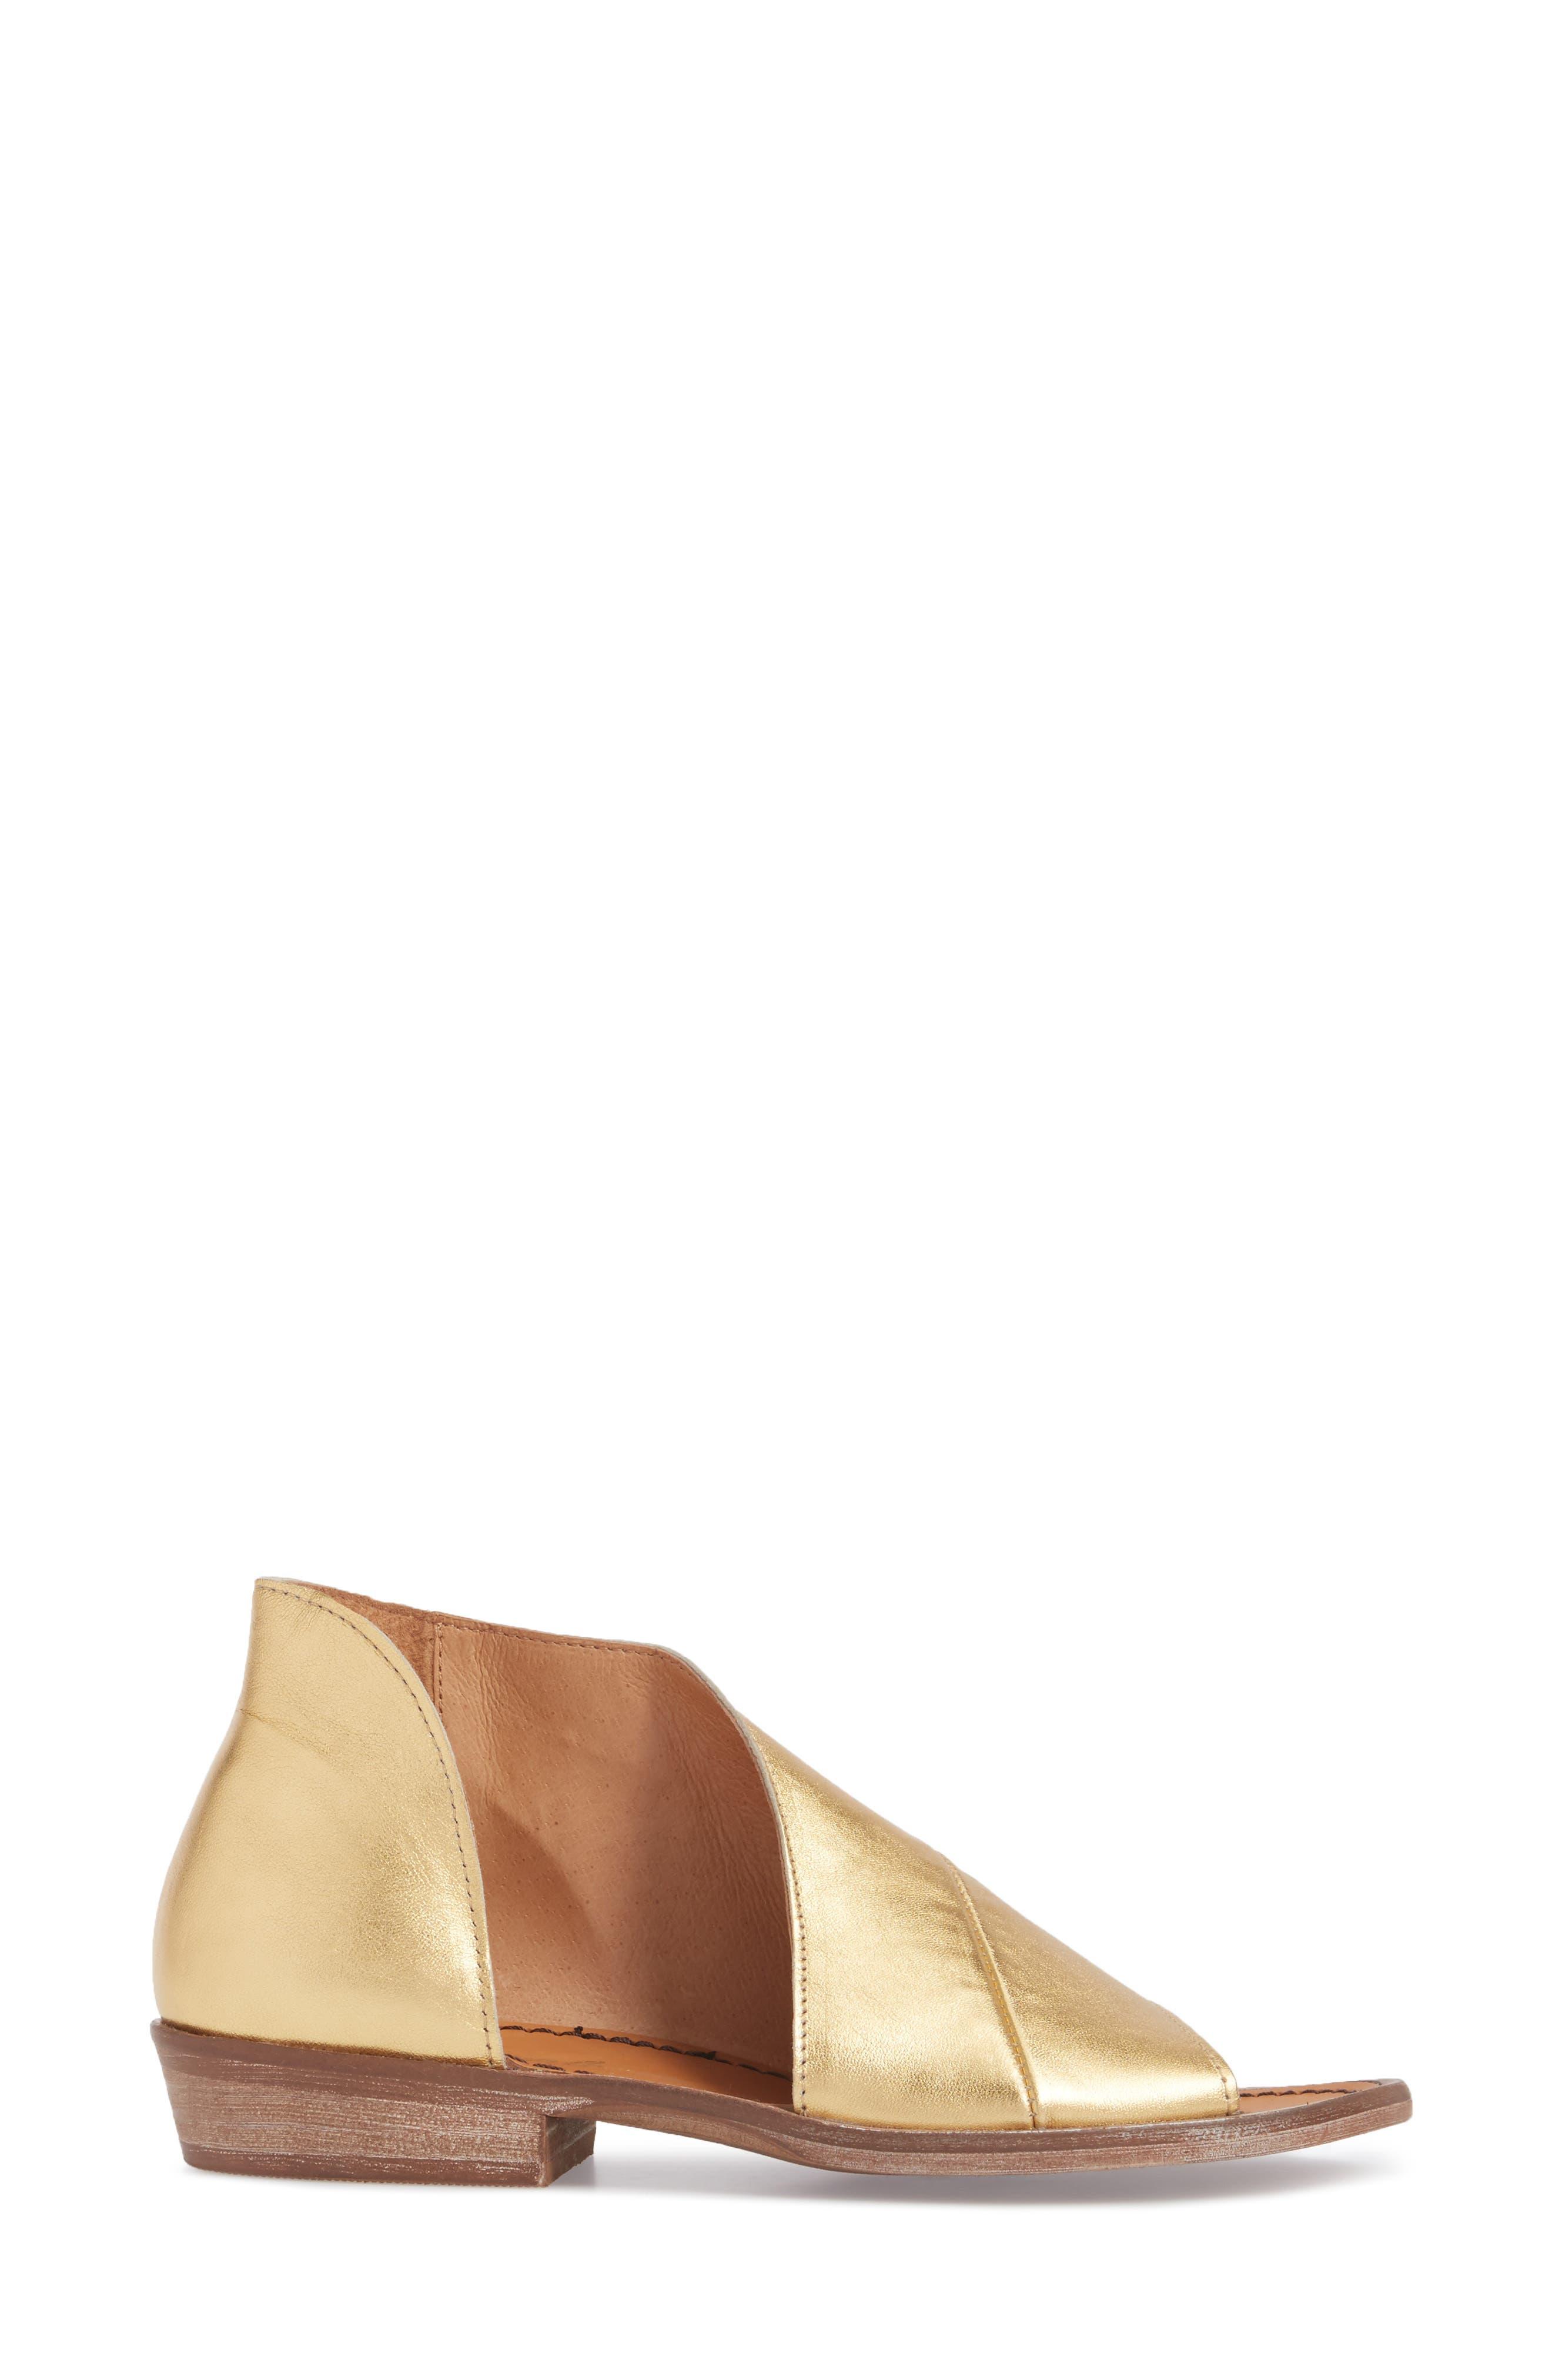 'Mont Blanc' Asymmetrical Sandal,                             Alternate thumbnail 34, color,